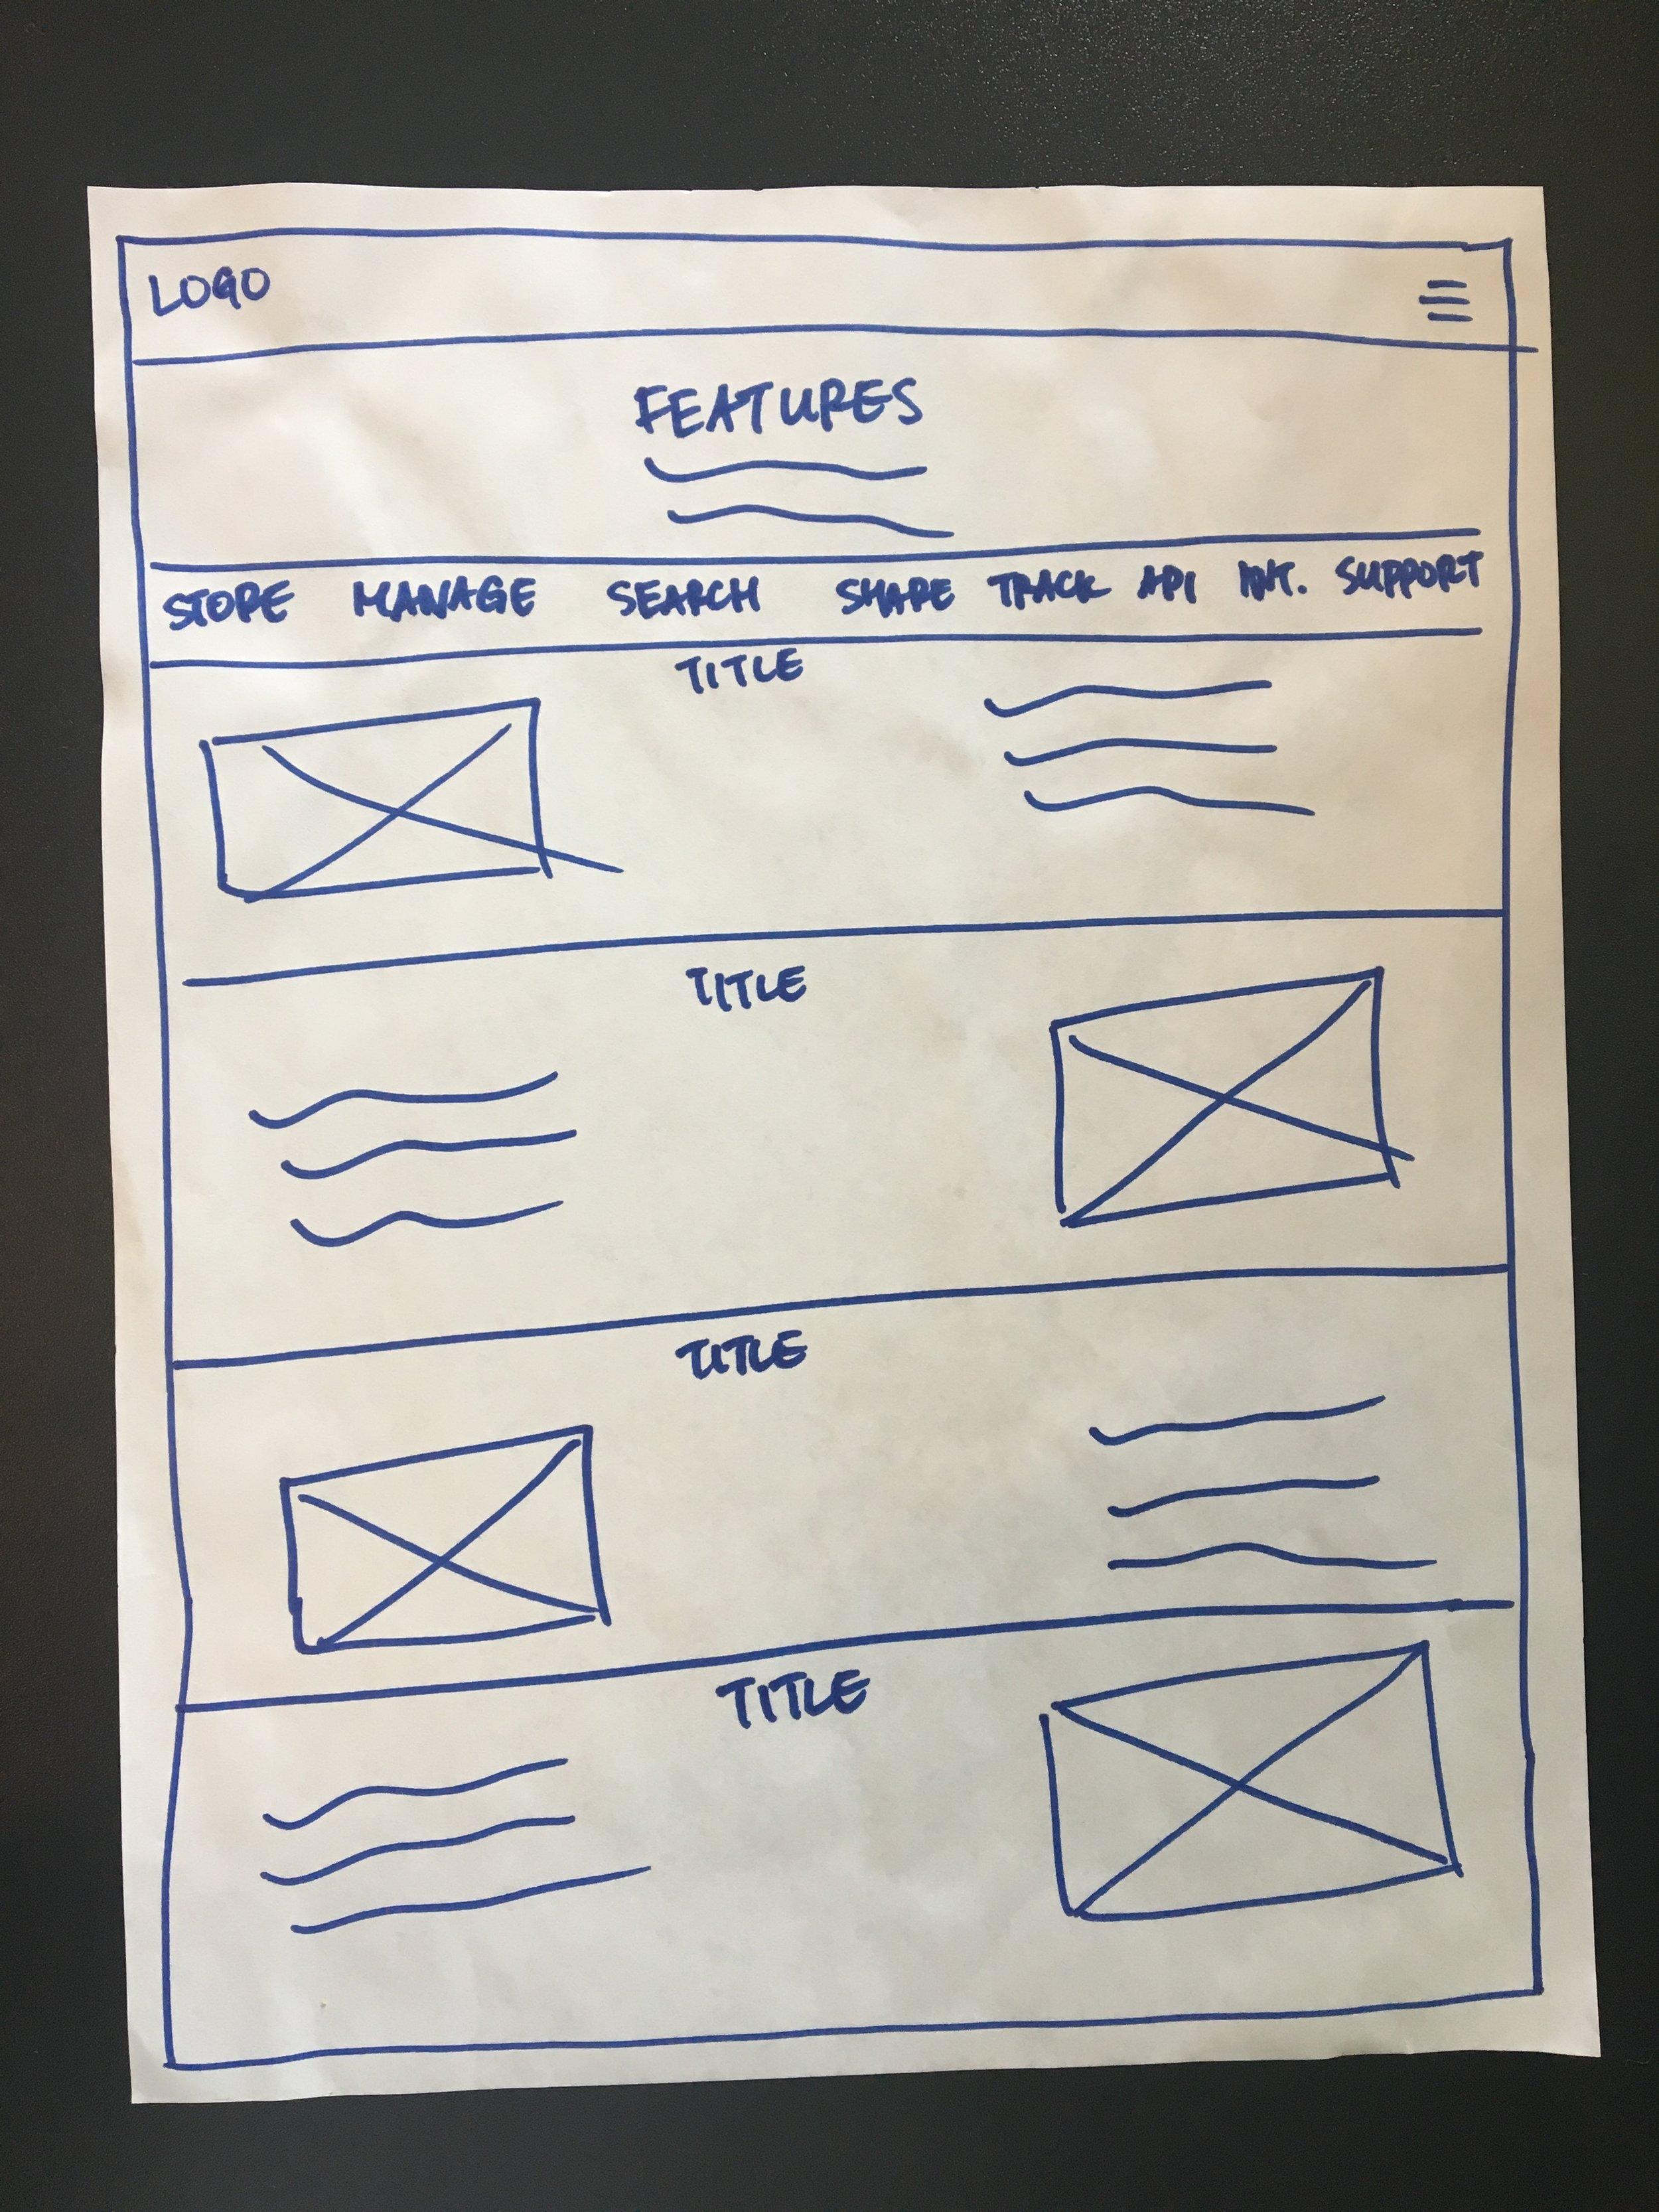 Features sketch